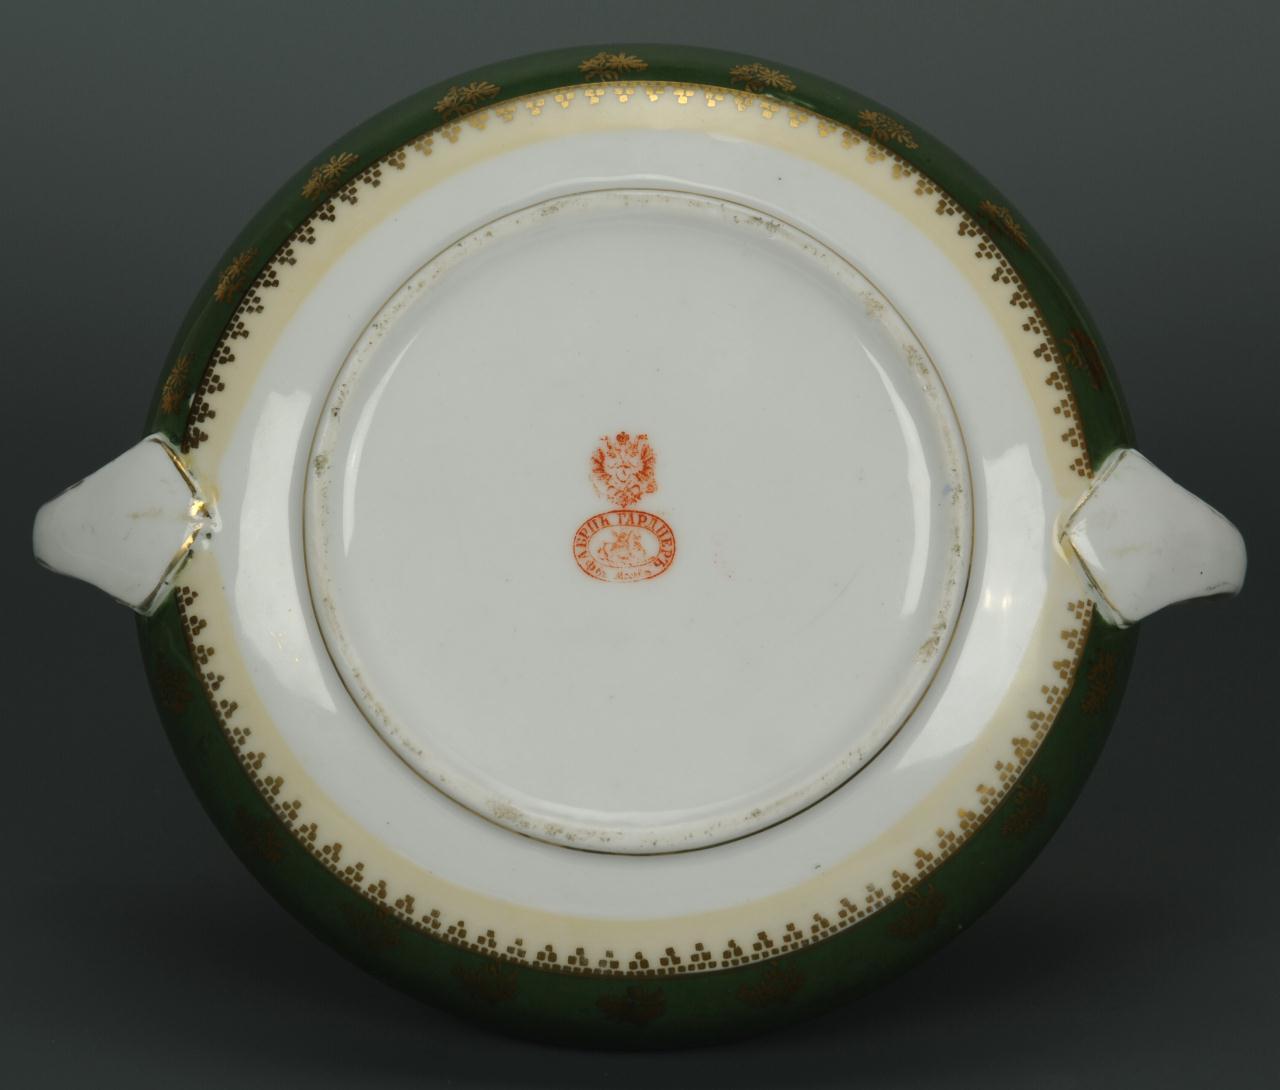 Lot 124 Imperial Russian Porcelain Bowl Gardner